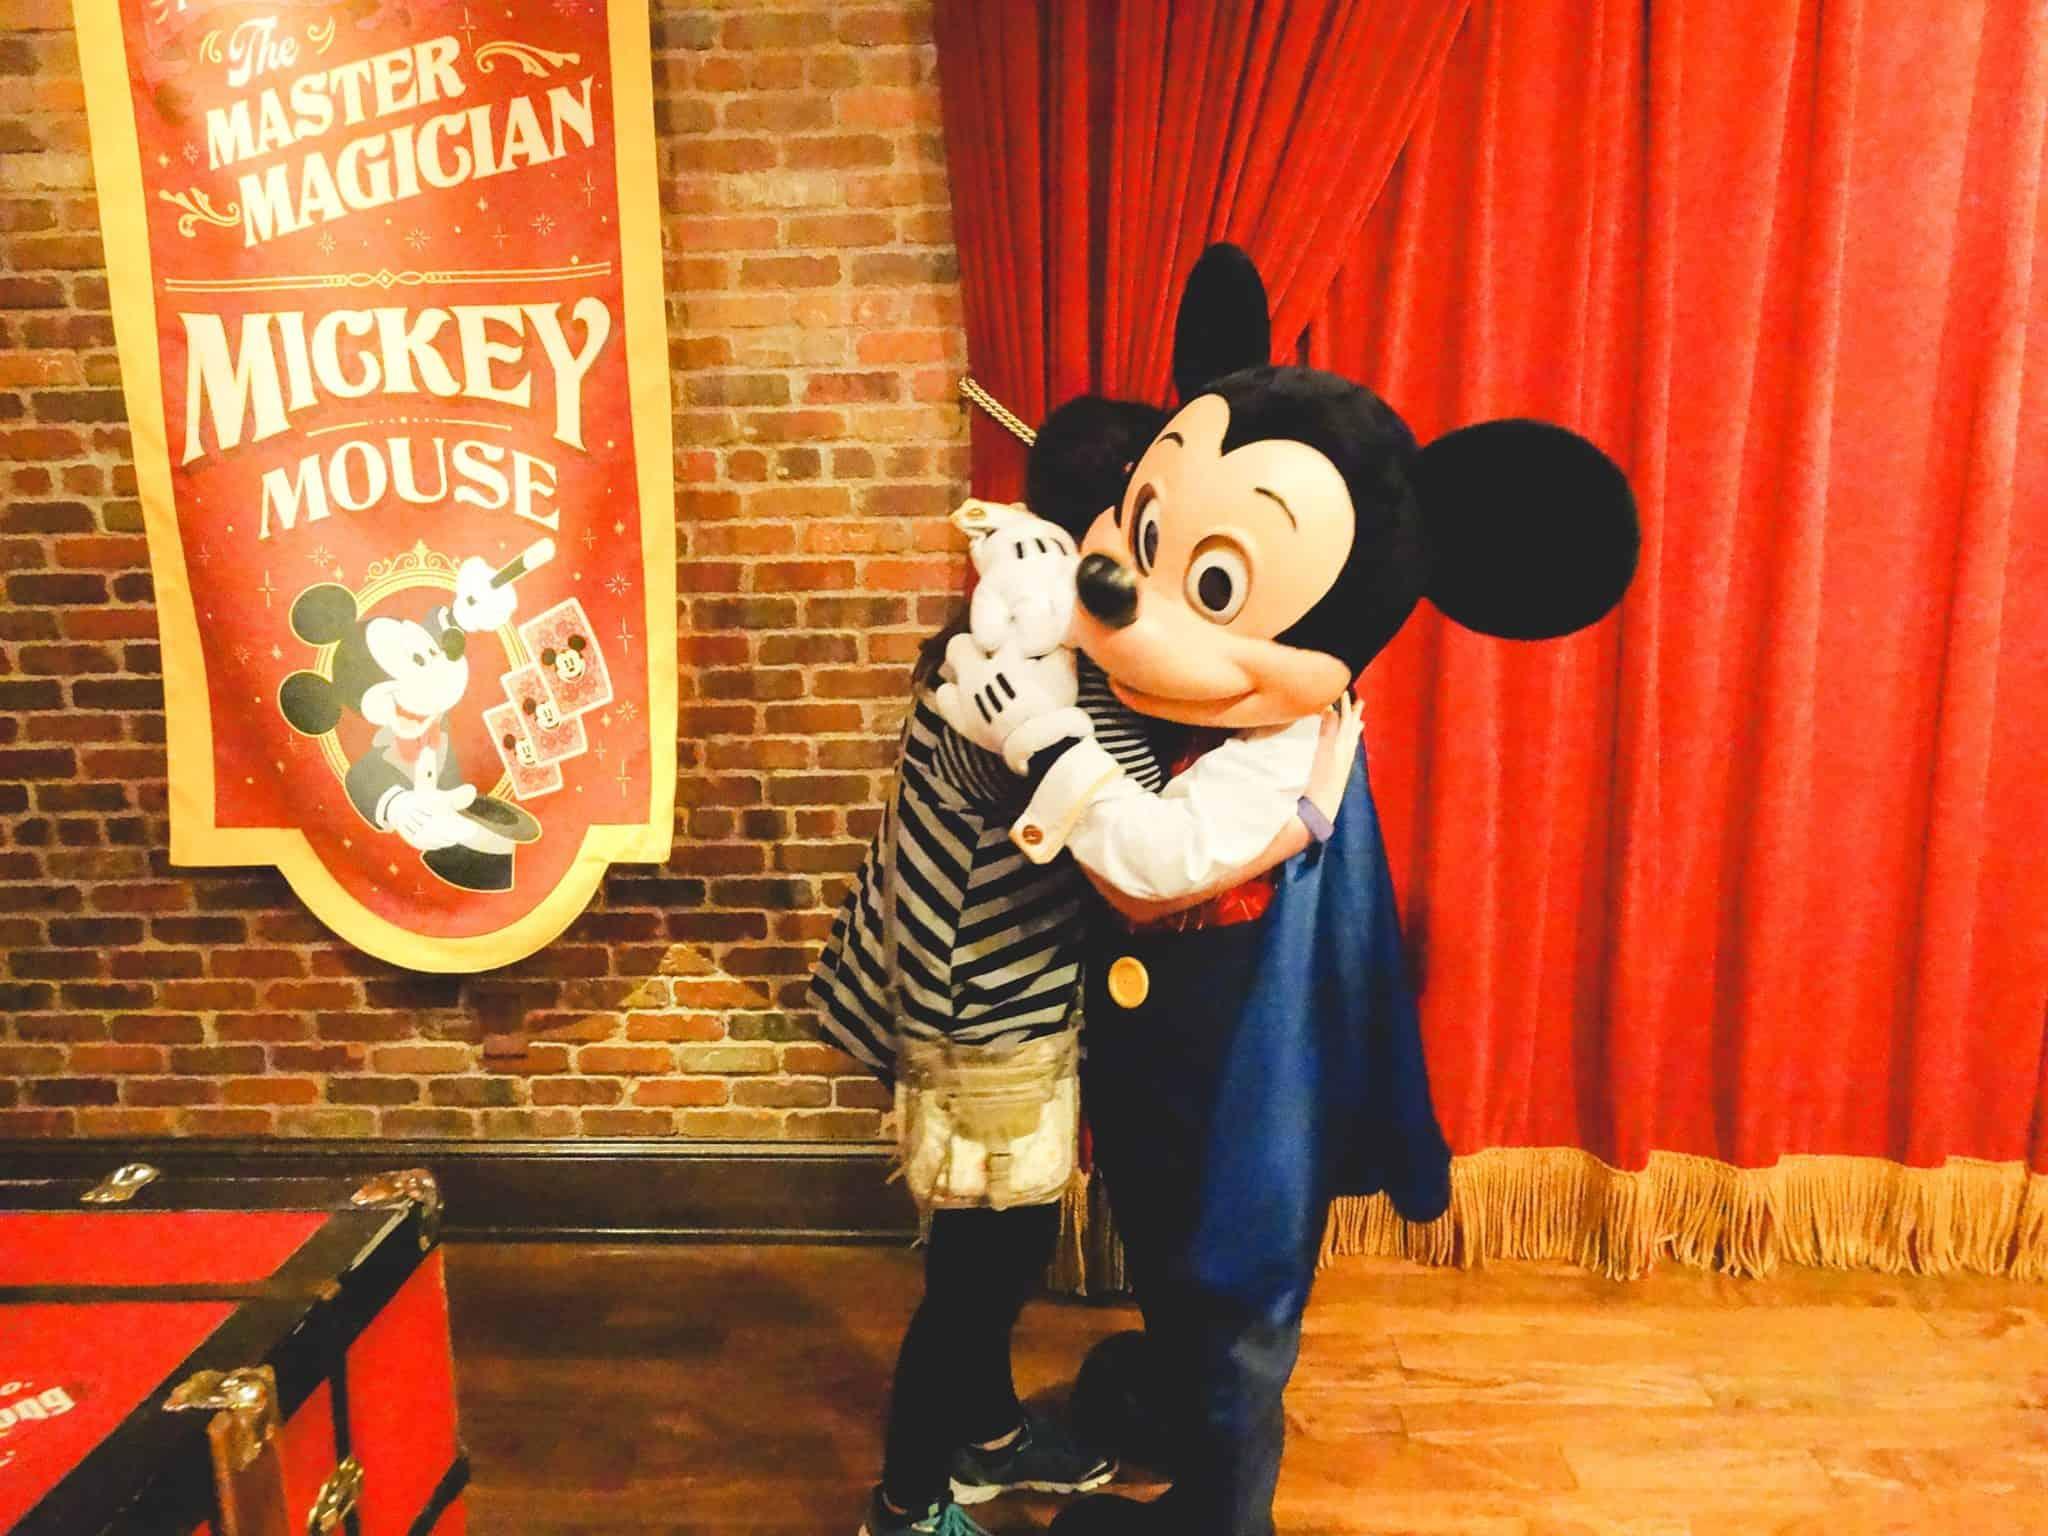 Hug from Mickey